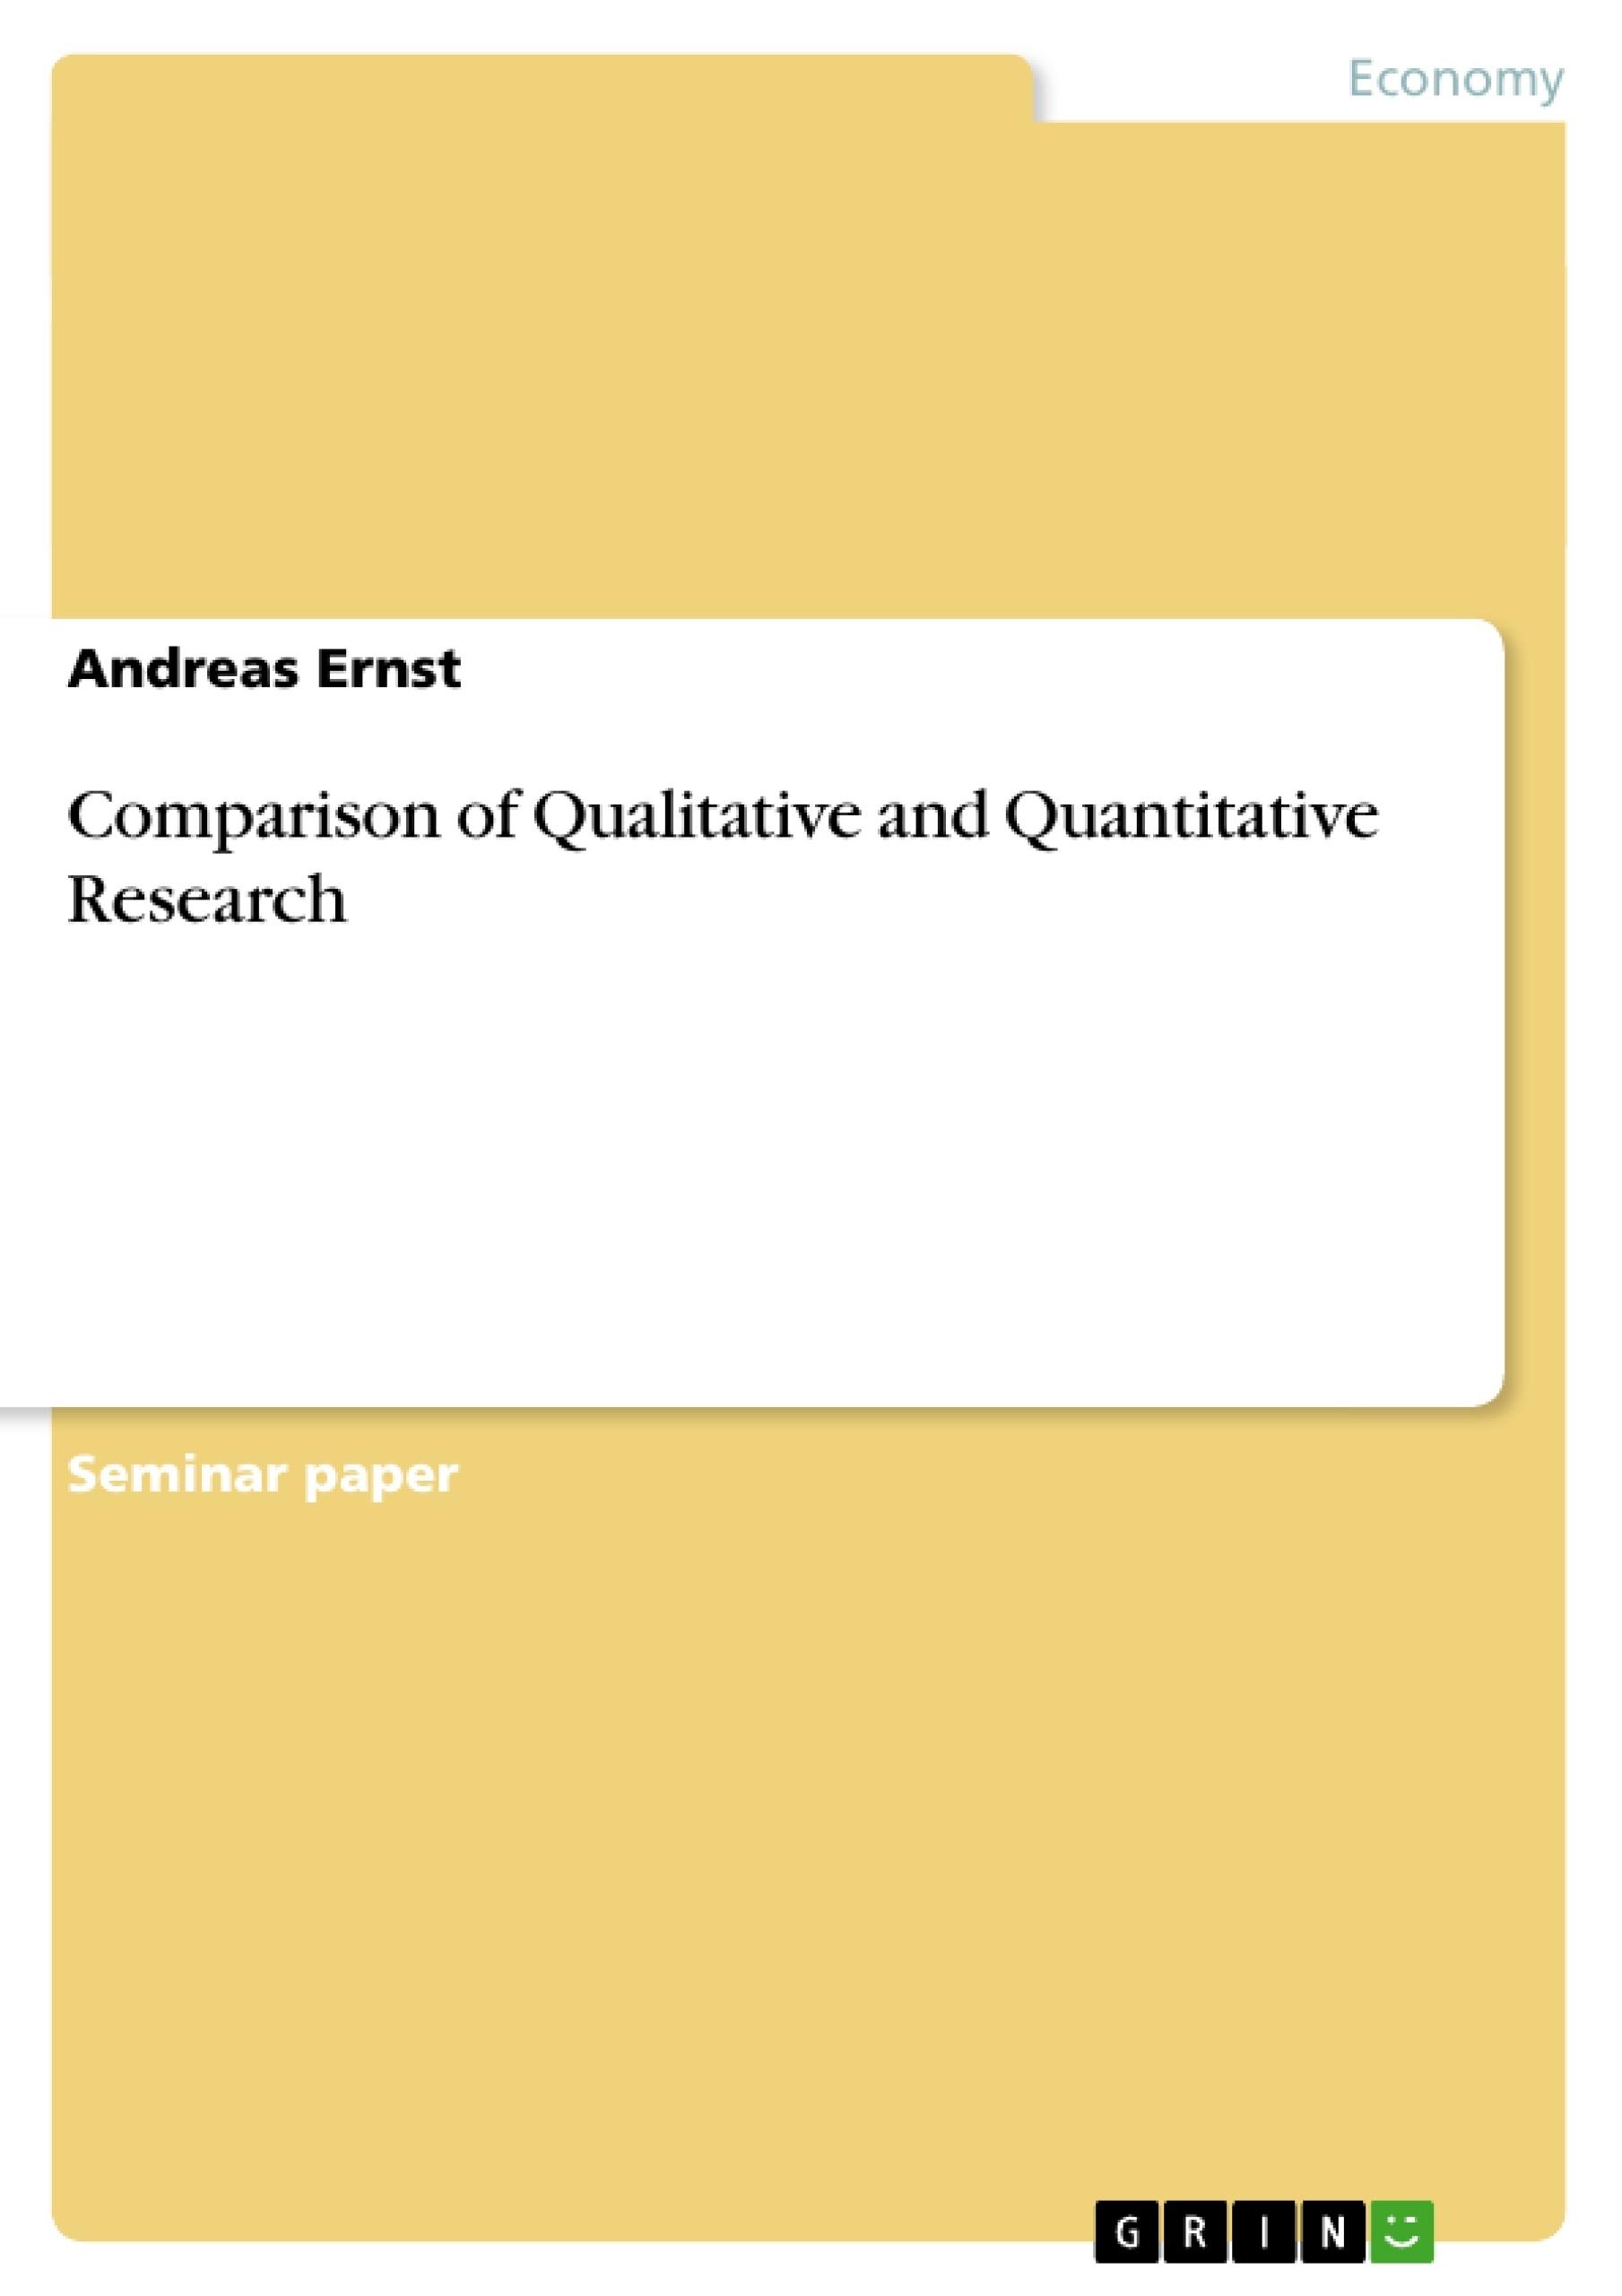 Title: Comparison of Qualitative and Quantitative Research